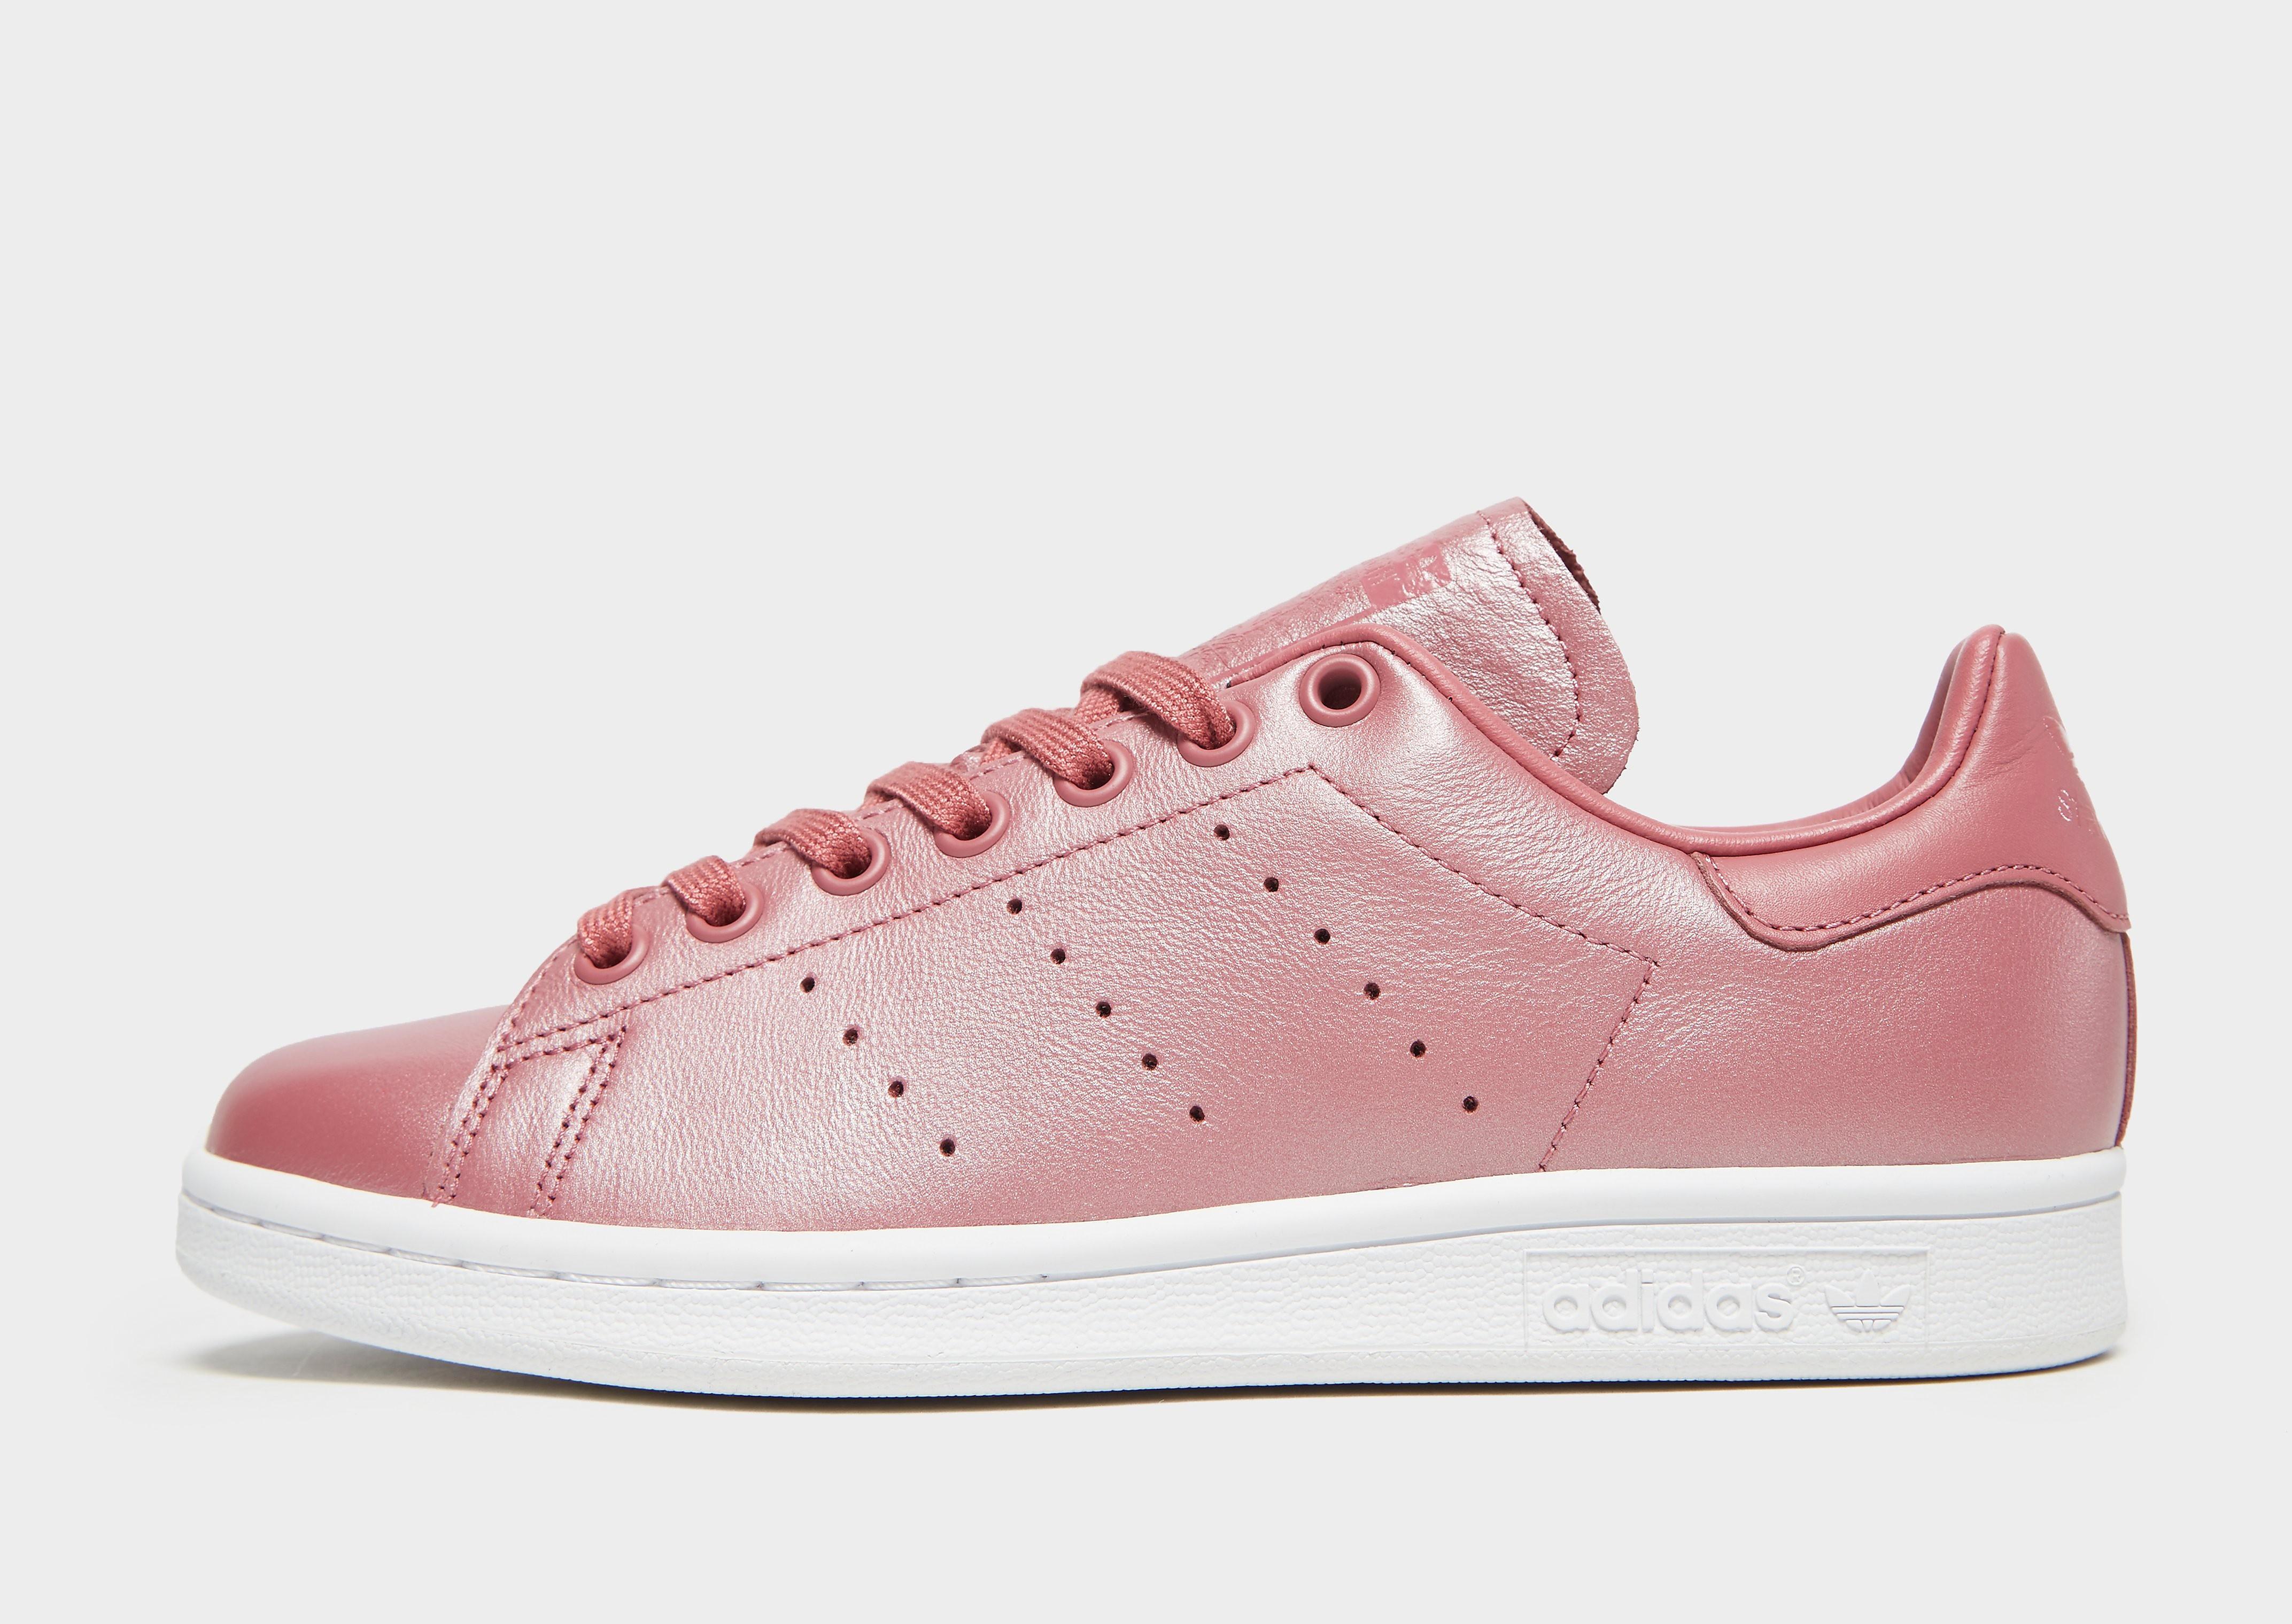 Adidas Stan Smith damessneaker roze